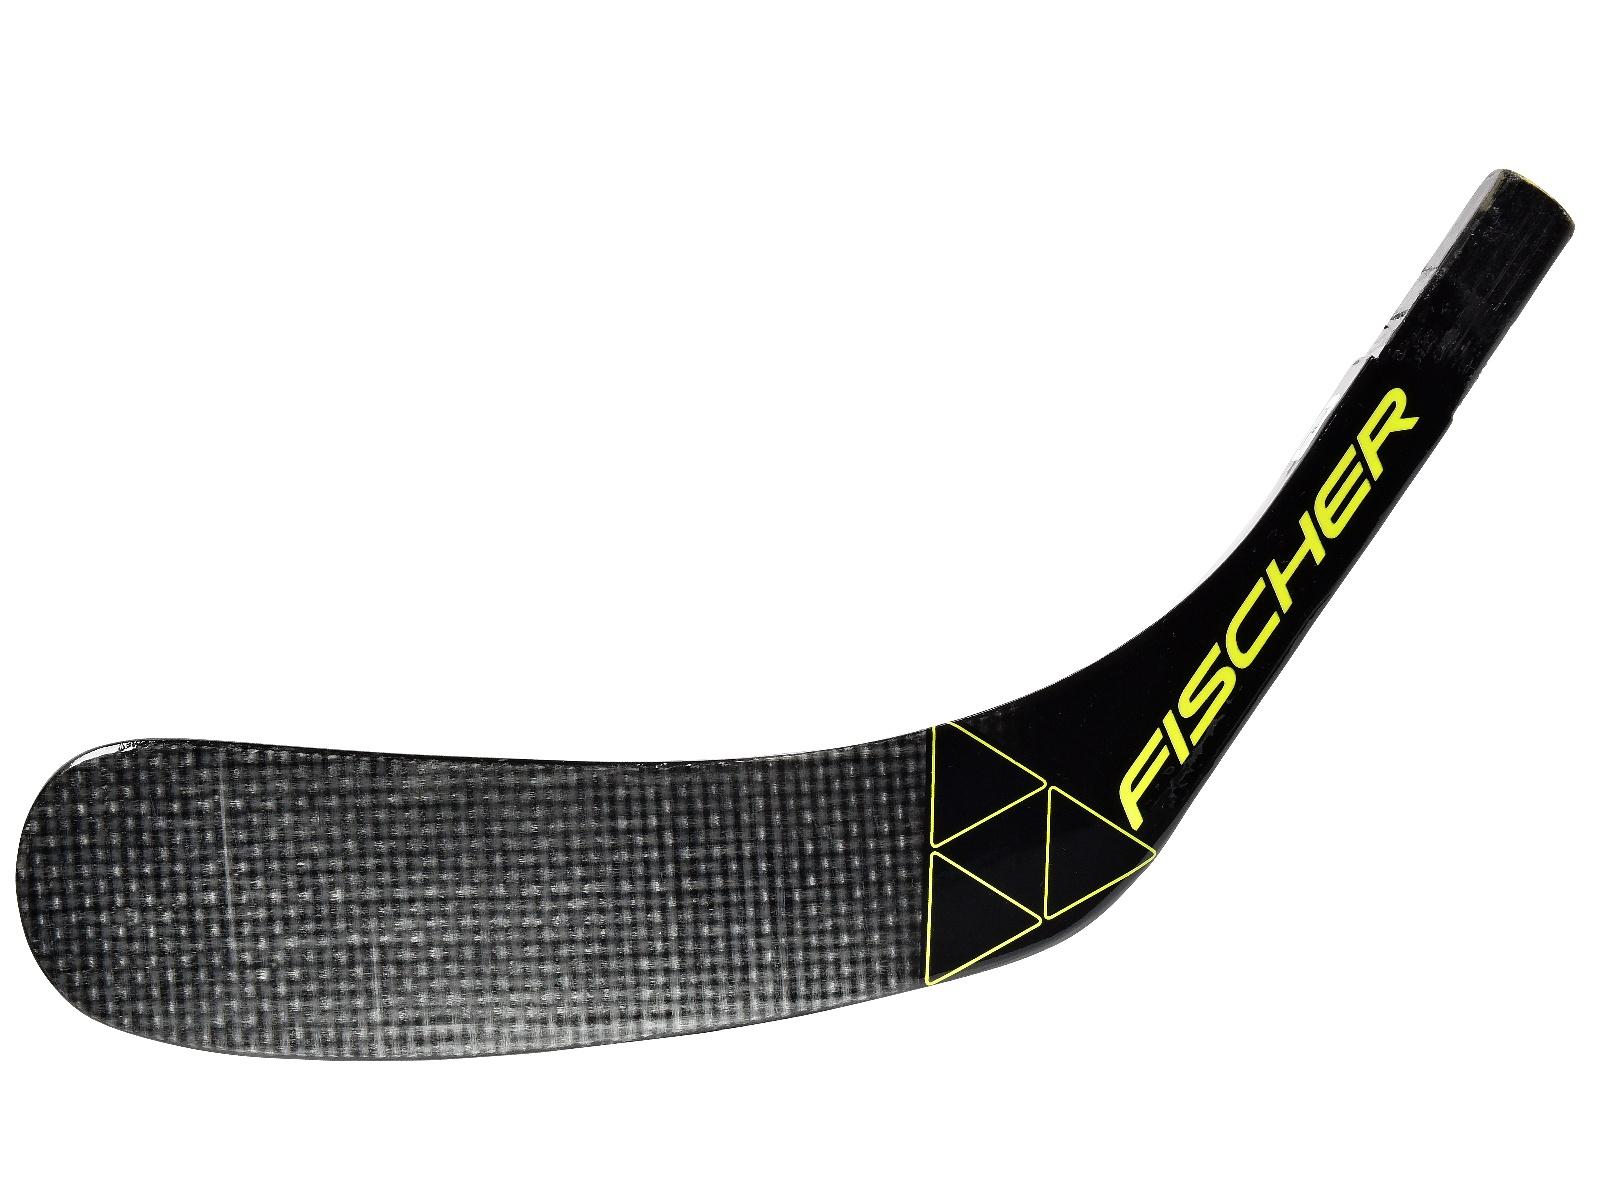 Hokejová čepel FISCHER W300 Senior - RH 92